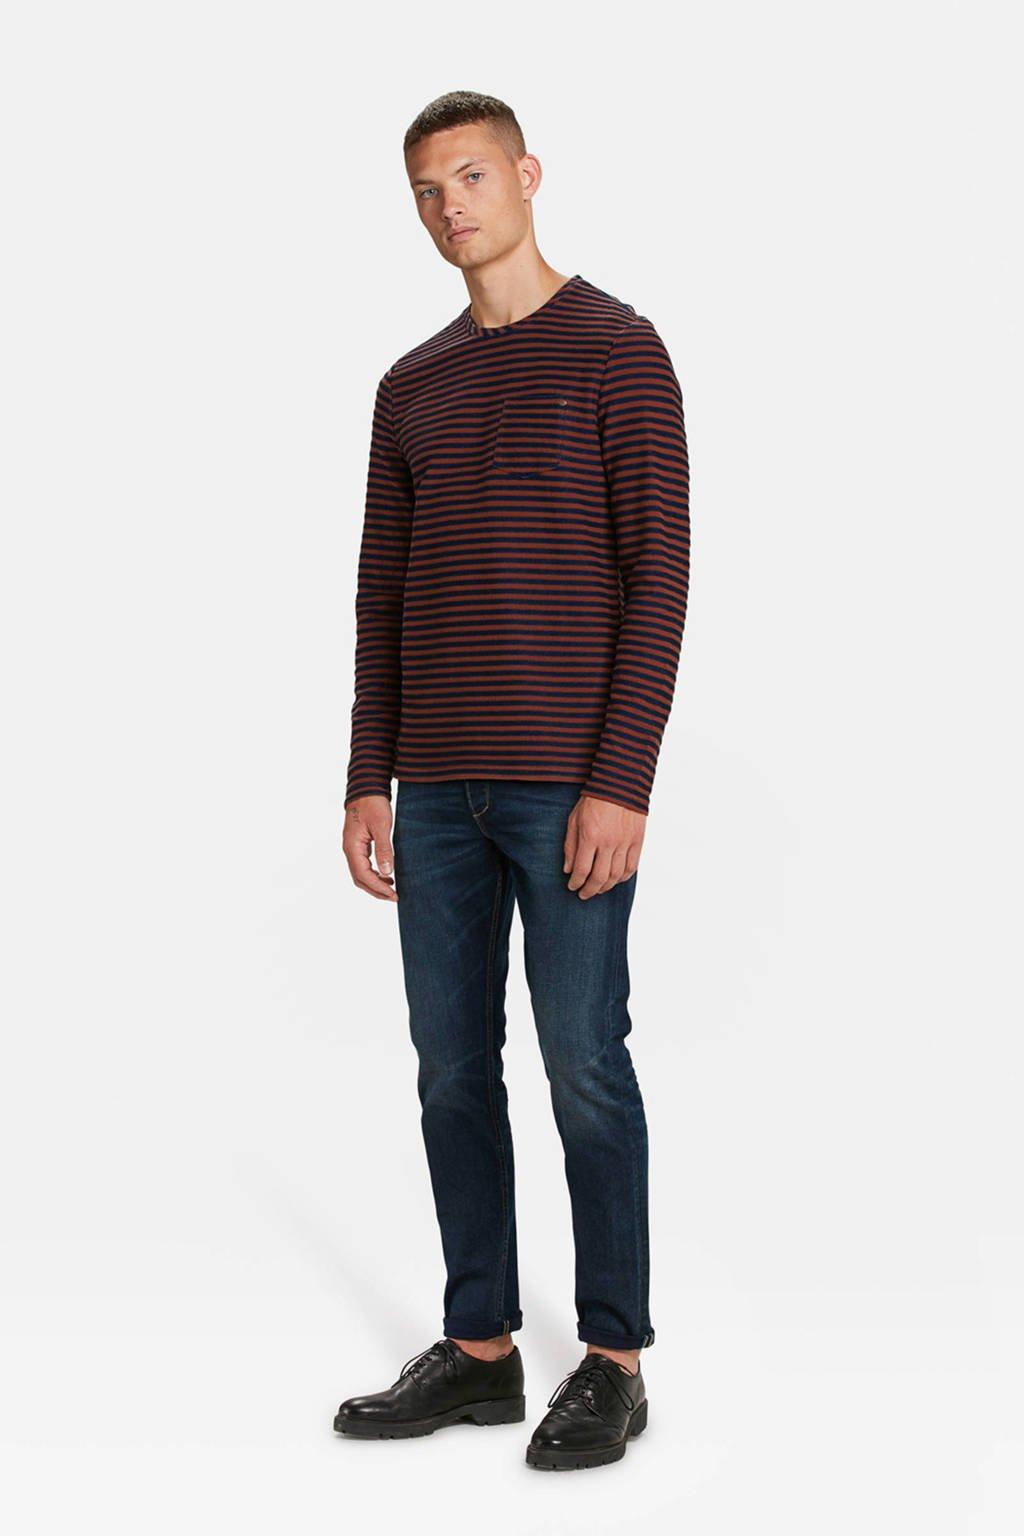 WE Fashion Blue Ridge gestreept T-shirt bruin/blauw, Bruin/blauw